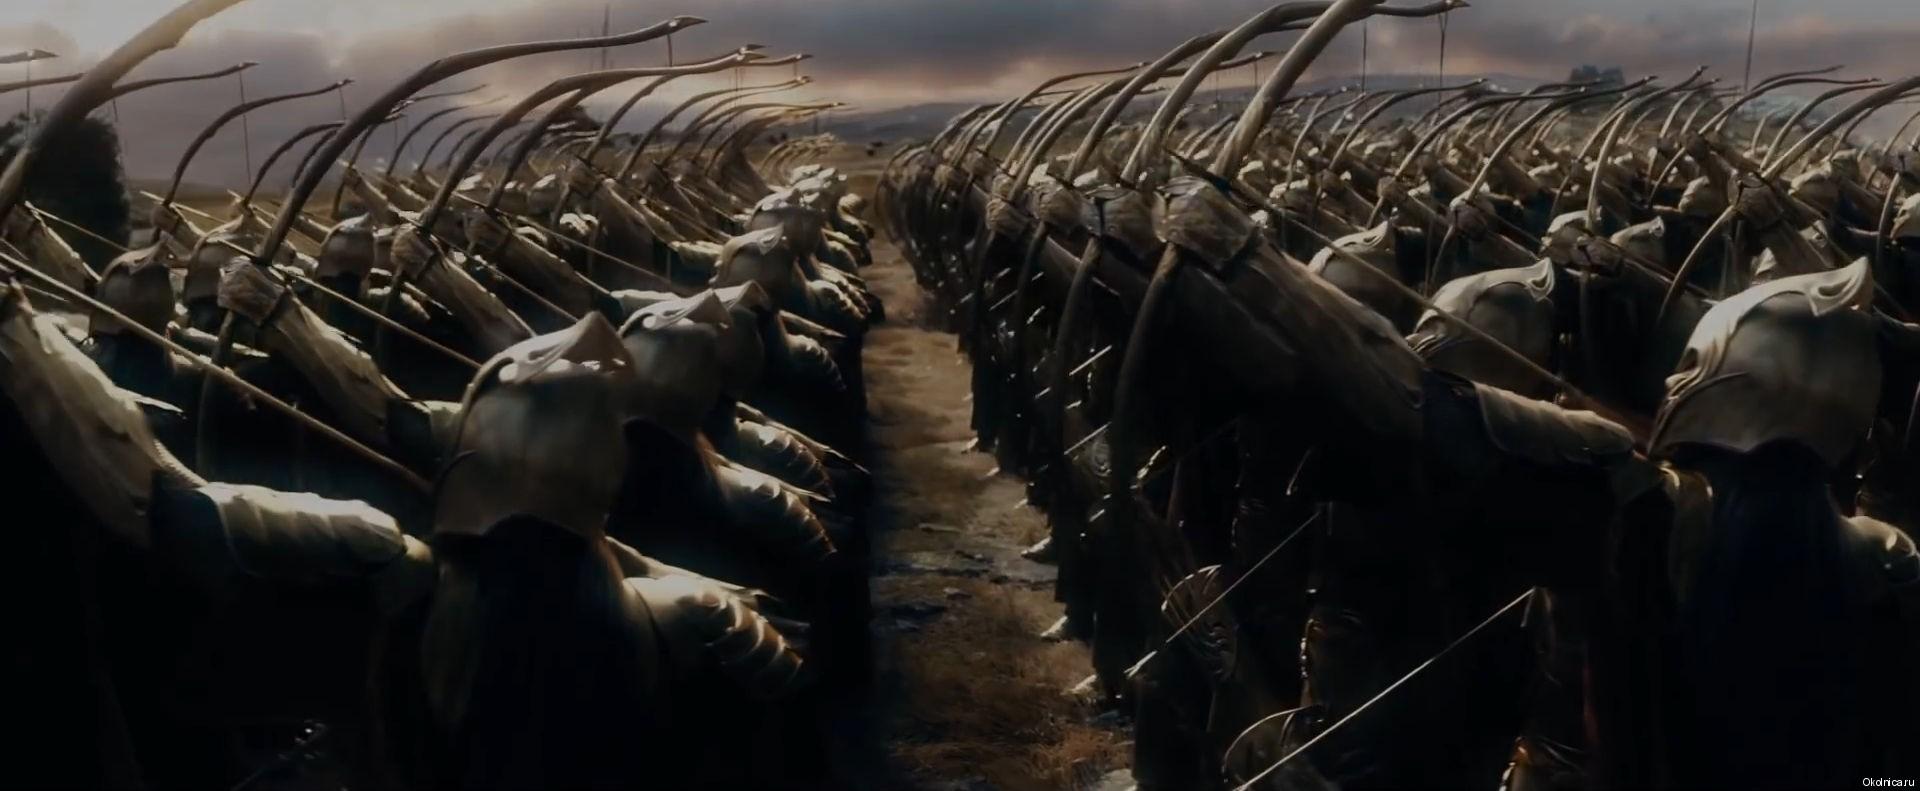 Kino_Hobbit_Bitva_pyati_voinstv_18